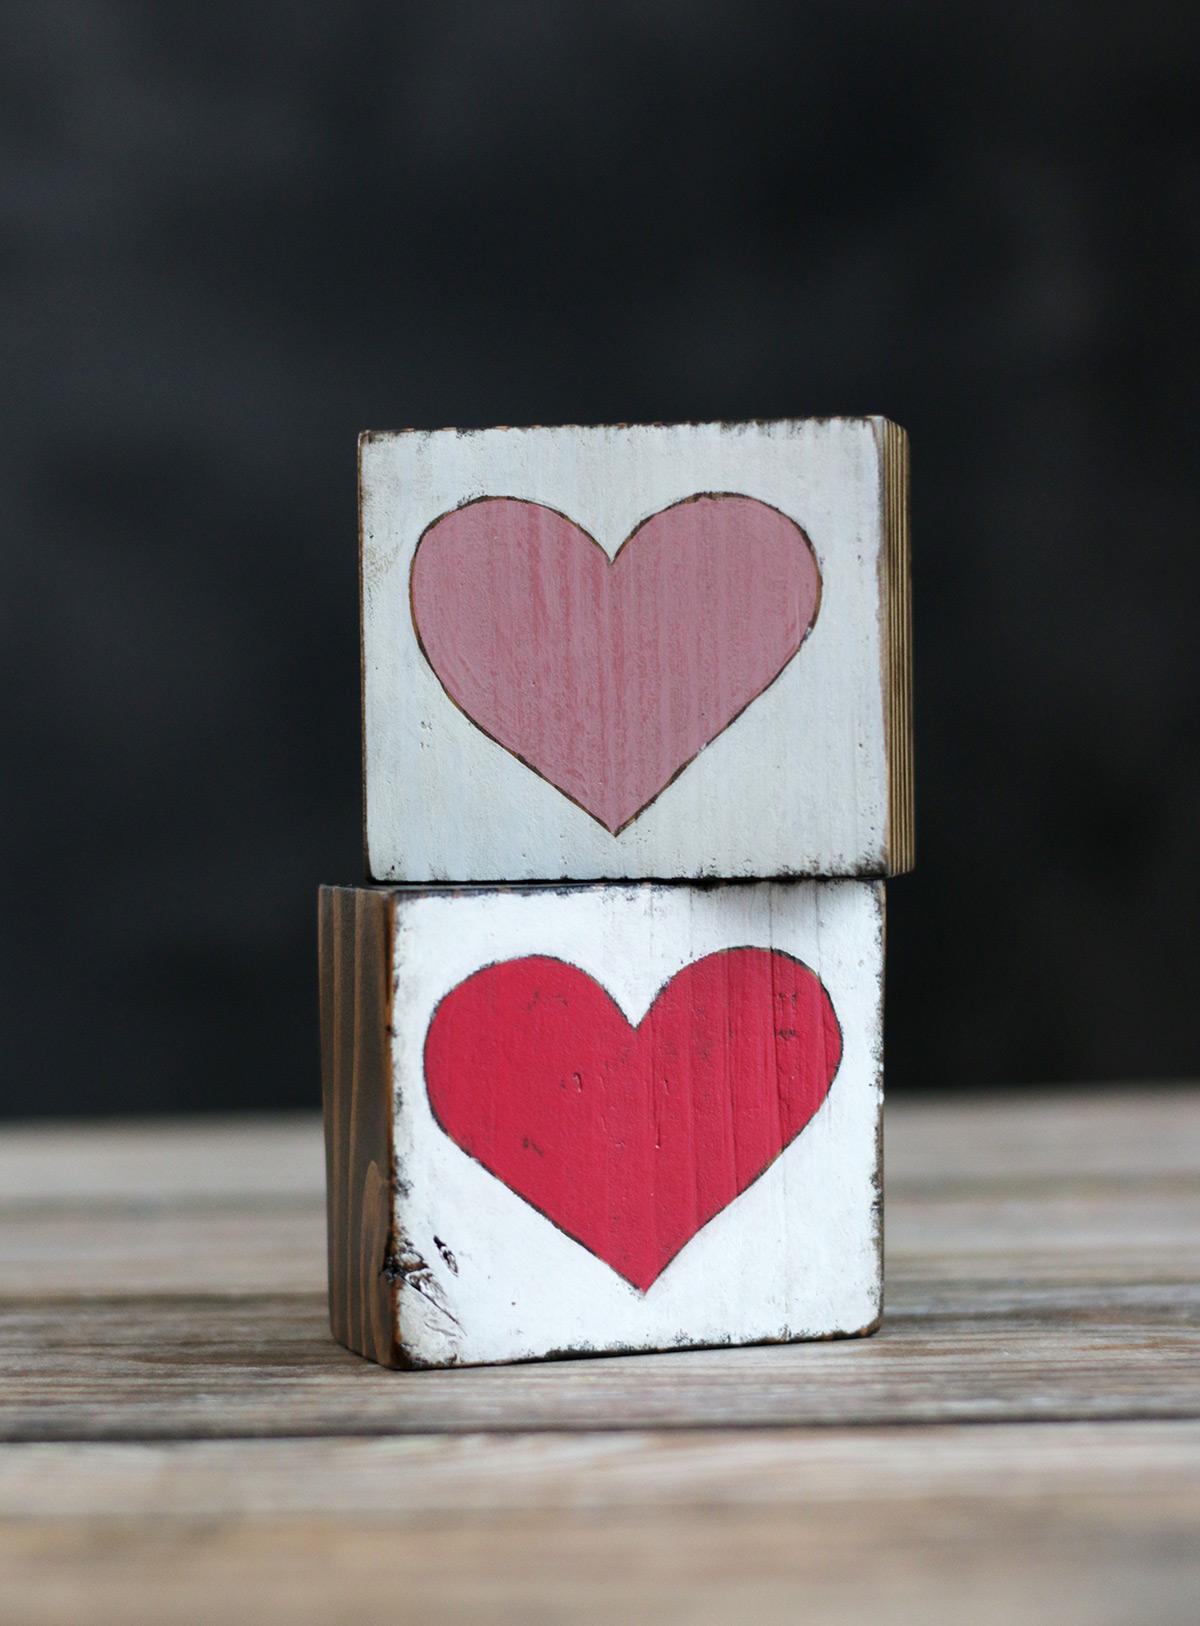 Heart Chunky Shelf Sitters